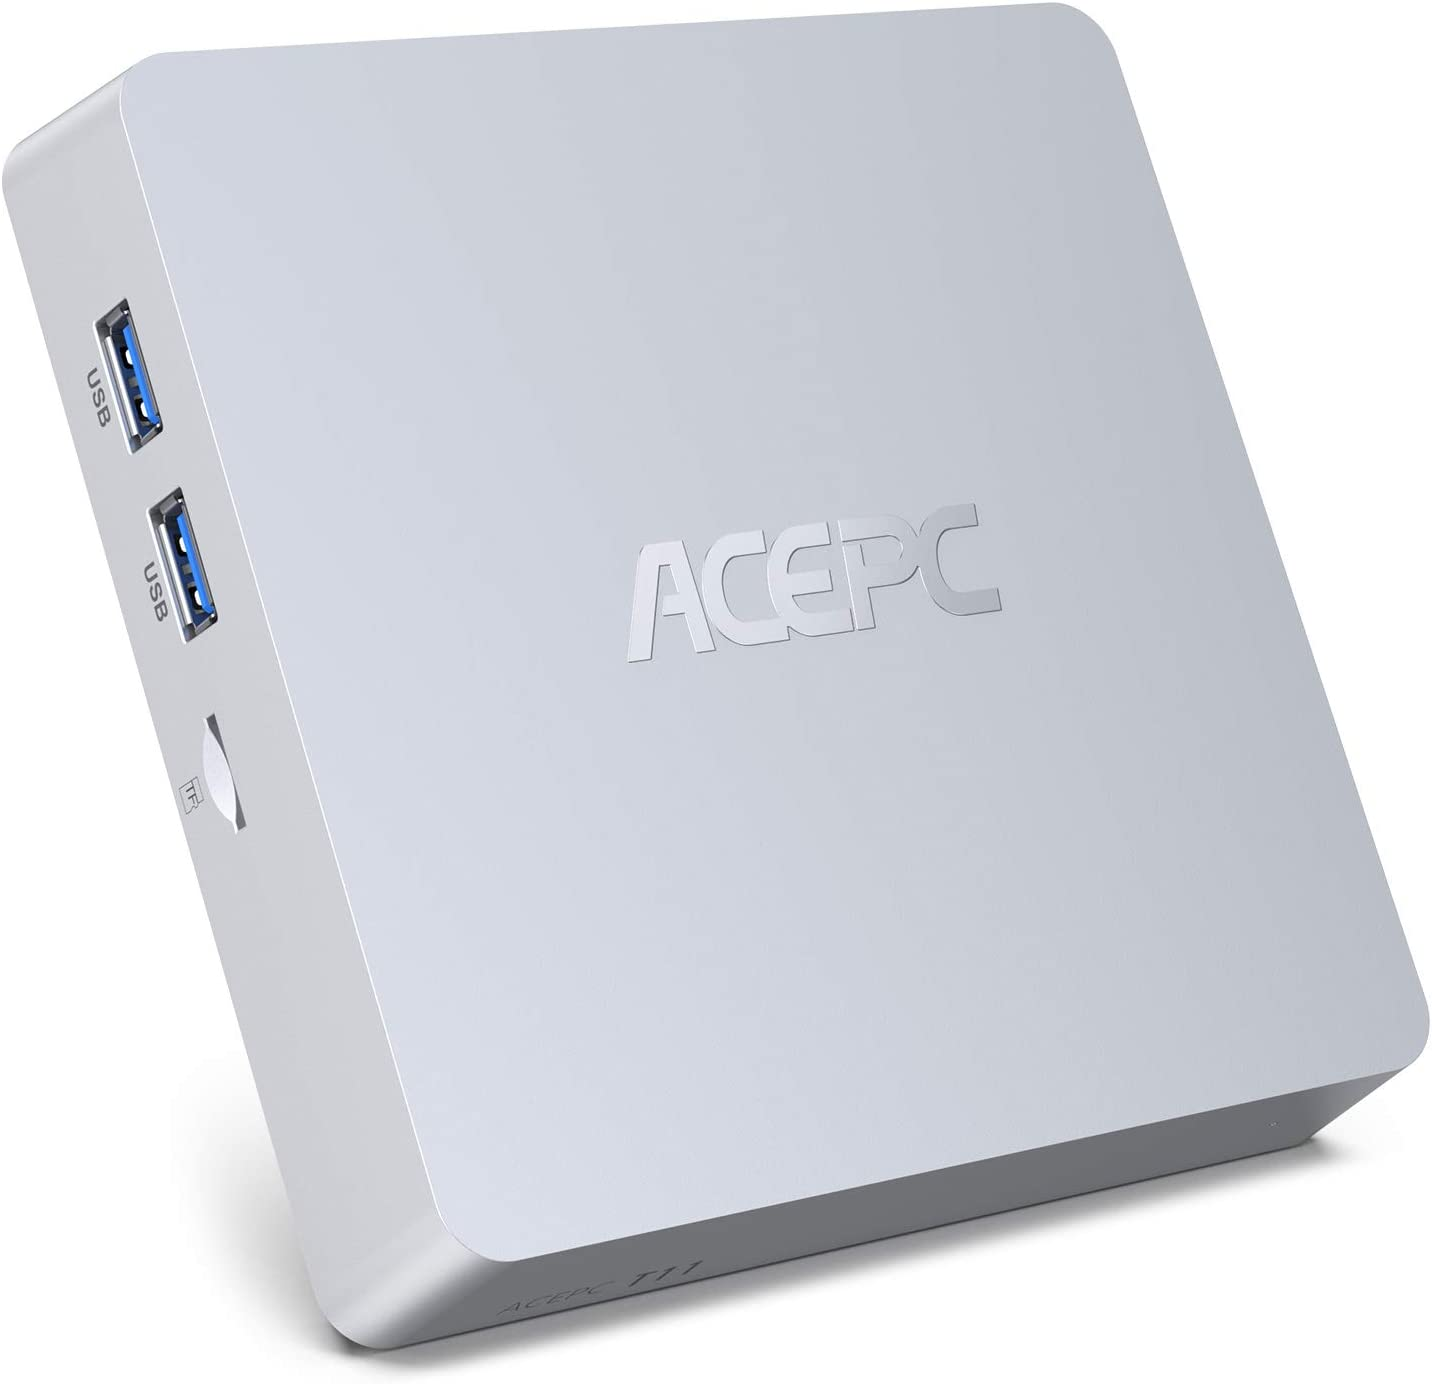 Mini PC,Windows 10 Pro Intel Atom Z8350 Mini computadora sin ventilador Computadora de escritorio de 8GB DDR3/128GB eMMC compatible con 4K HD,Salida HDMI + VGA, WiFi 2.4G/5G,Gigabit Ethernet,Bluetooth